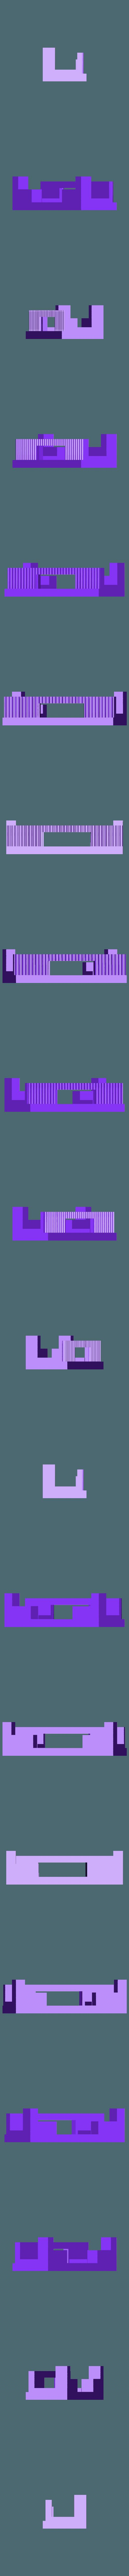 PCB_2_v57_PCB_2_v57_Component19_2_Body35_Component19_1.stl Télécharger fichier STL gratuit Cyclone PCB Factory Dual Z-axis • Objet pour impression 3D, TinkersProjects